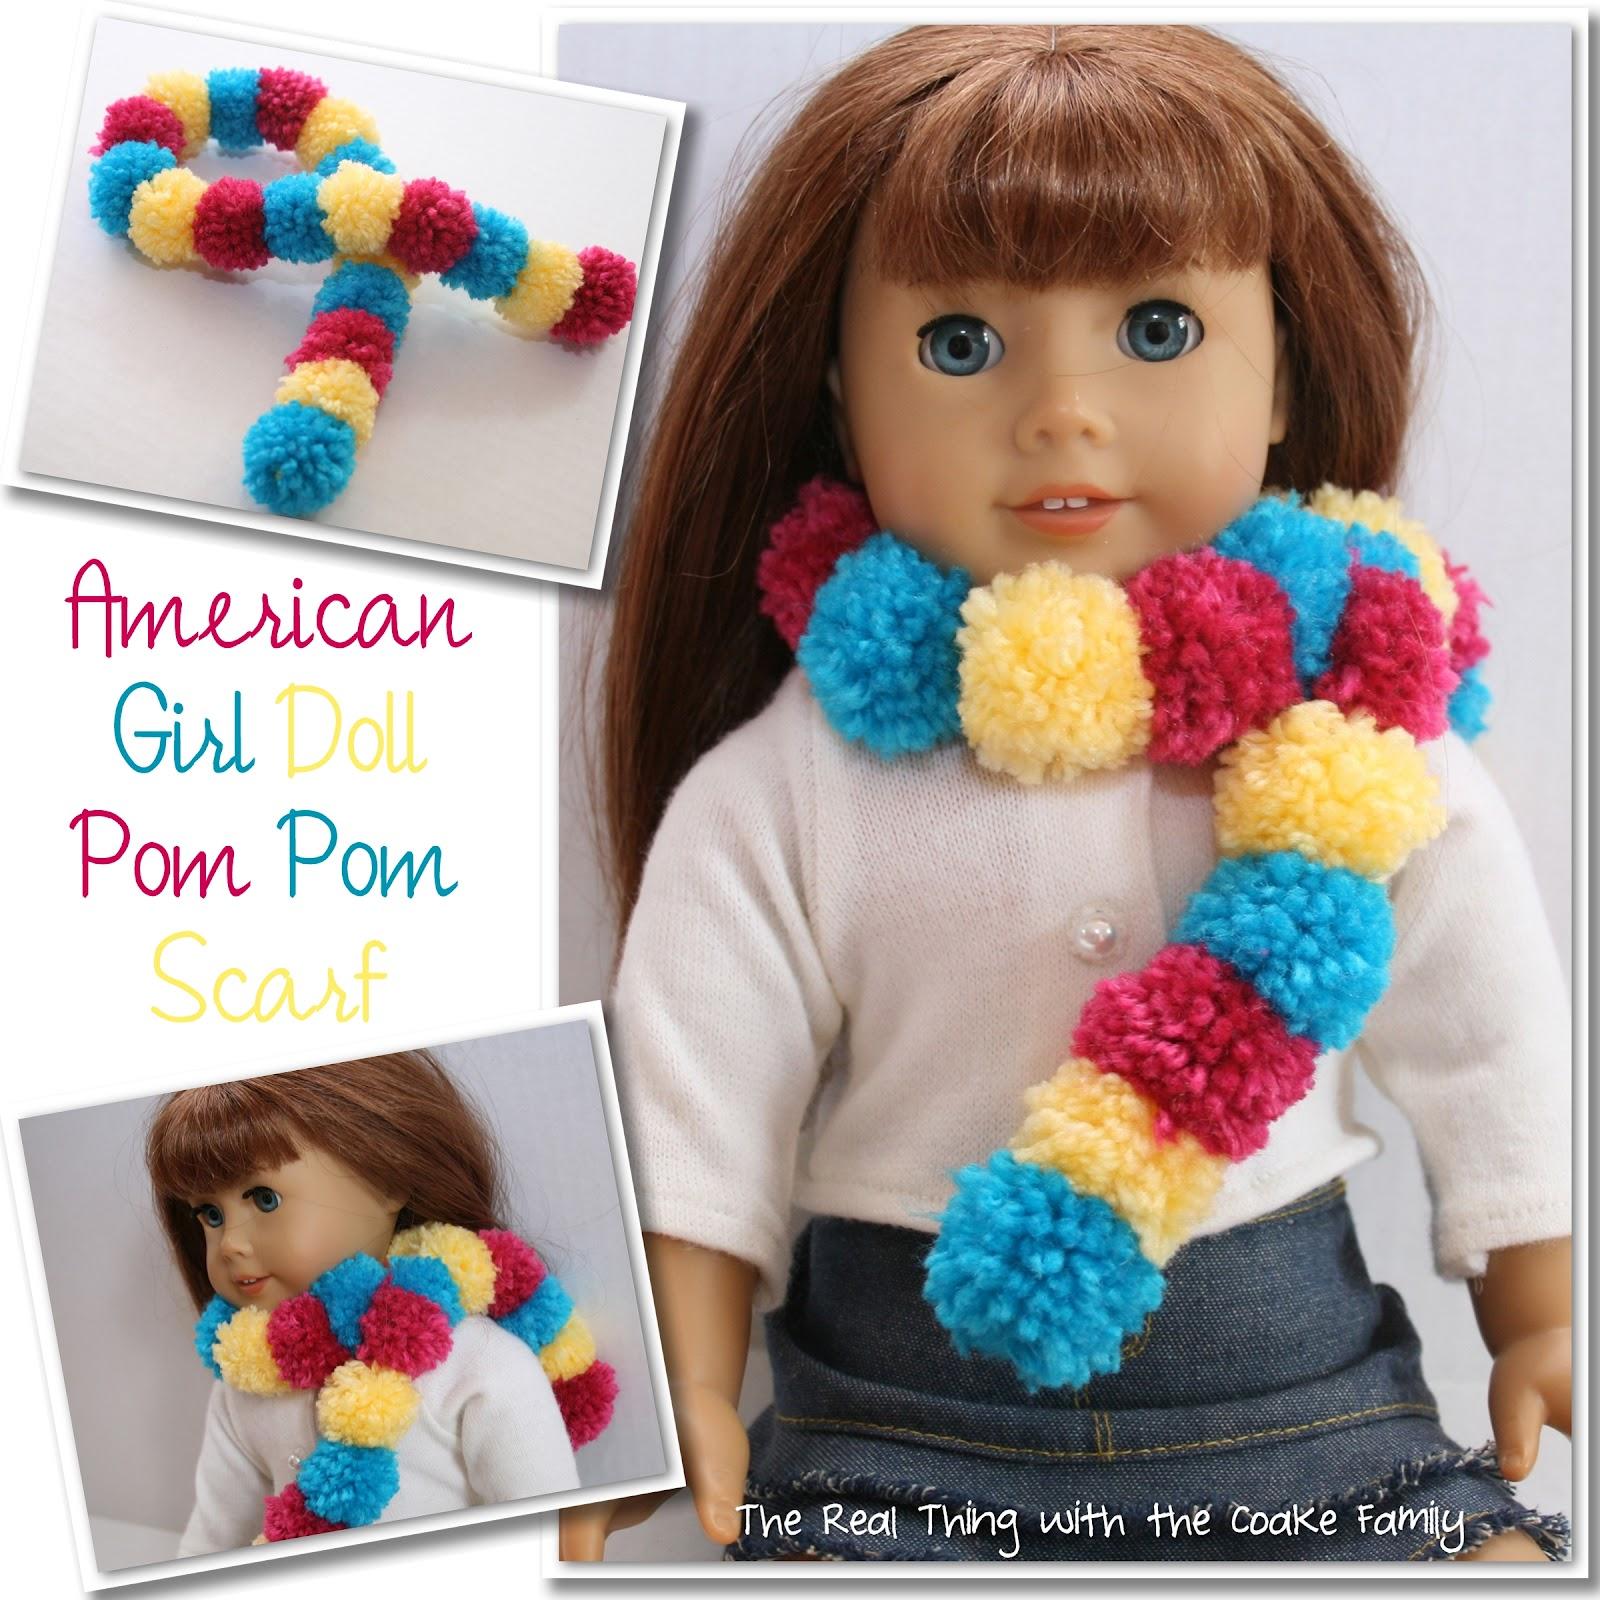 make an adorable american girl doll craft - a pom pom scarf